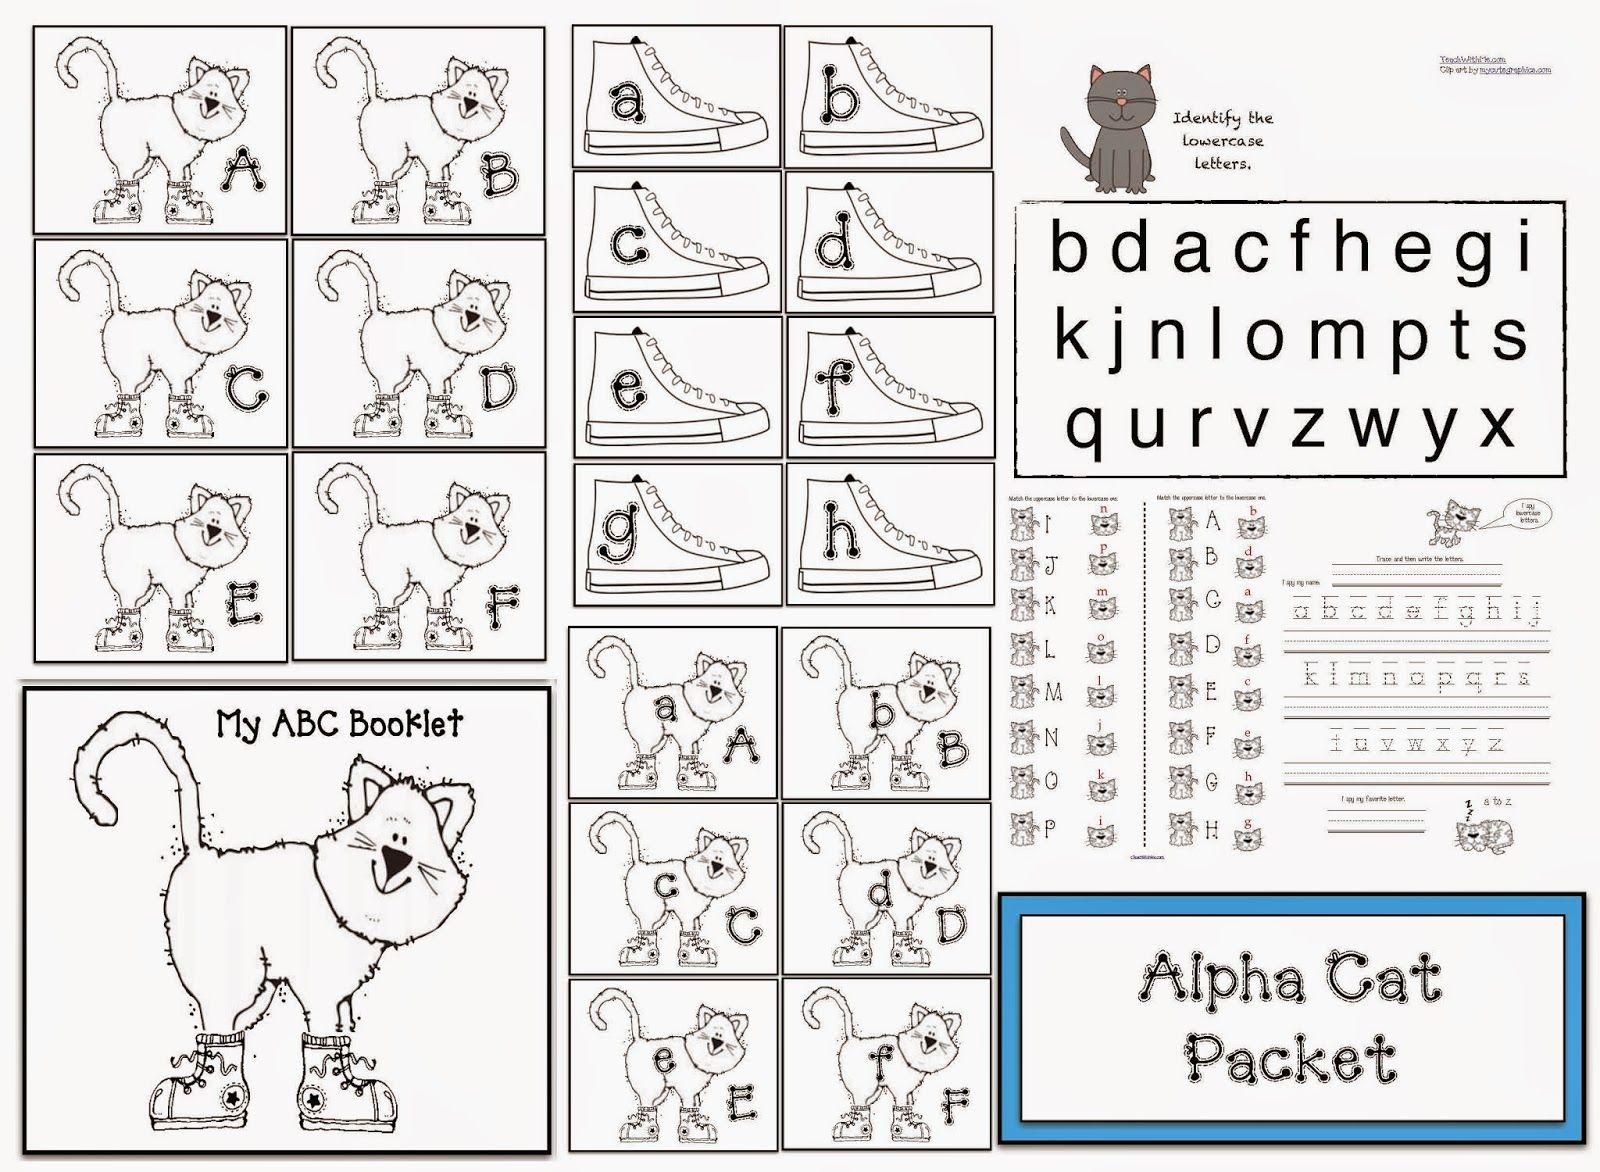 Alpha Cat Packet